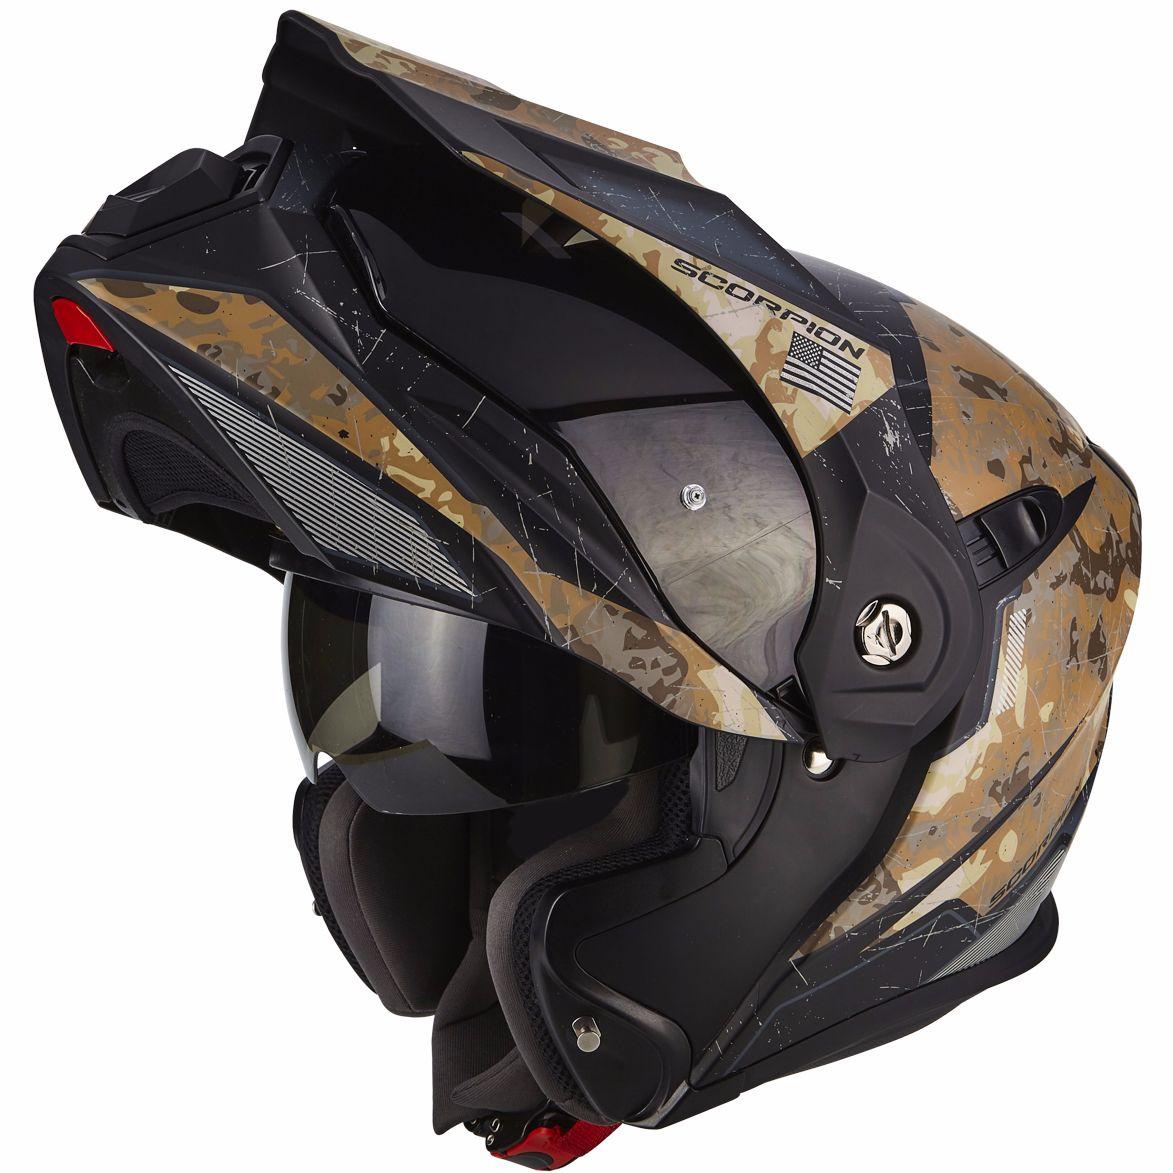 casque scorpion exo adx 1 battleflage casque modulable. Black Bedroom Furniture Sets. Home Design Ideas